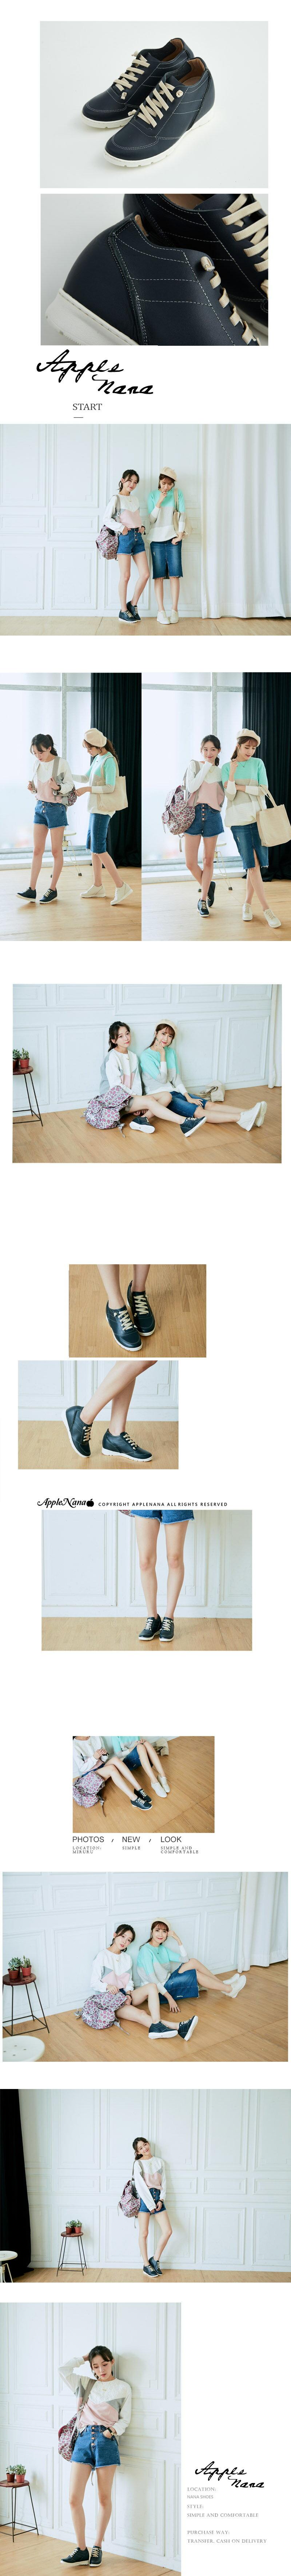 AppleNana蘋果奈奈【QT219911580】時尚部落客運動風潮隱形內增高真皮氣墊鞋 4